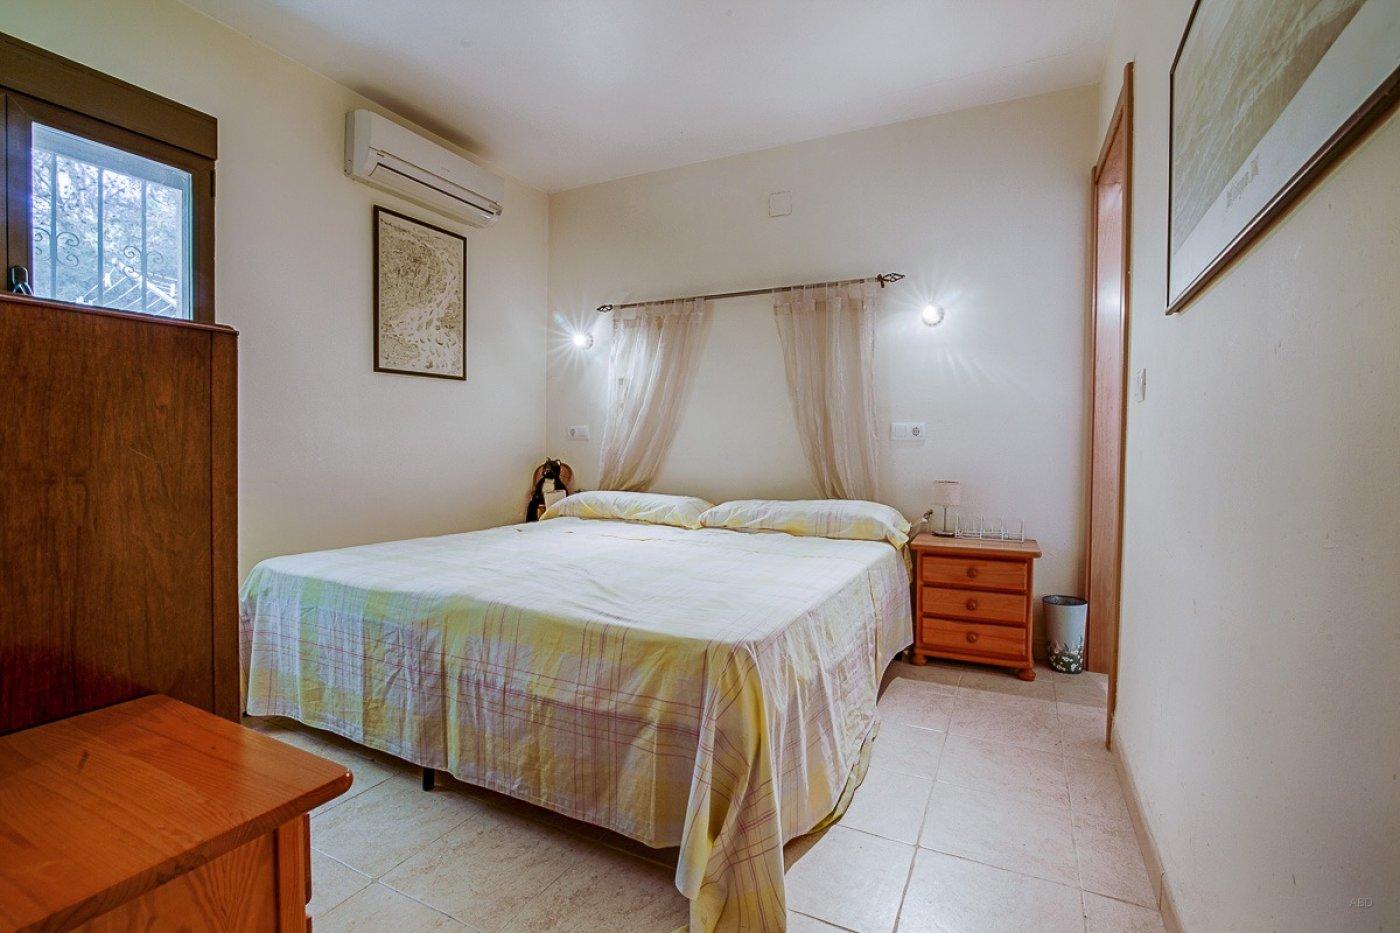 Villa - Ready To Move And Live - Montemar - Benissa